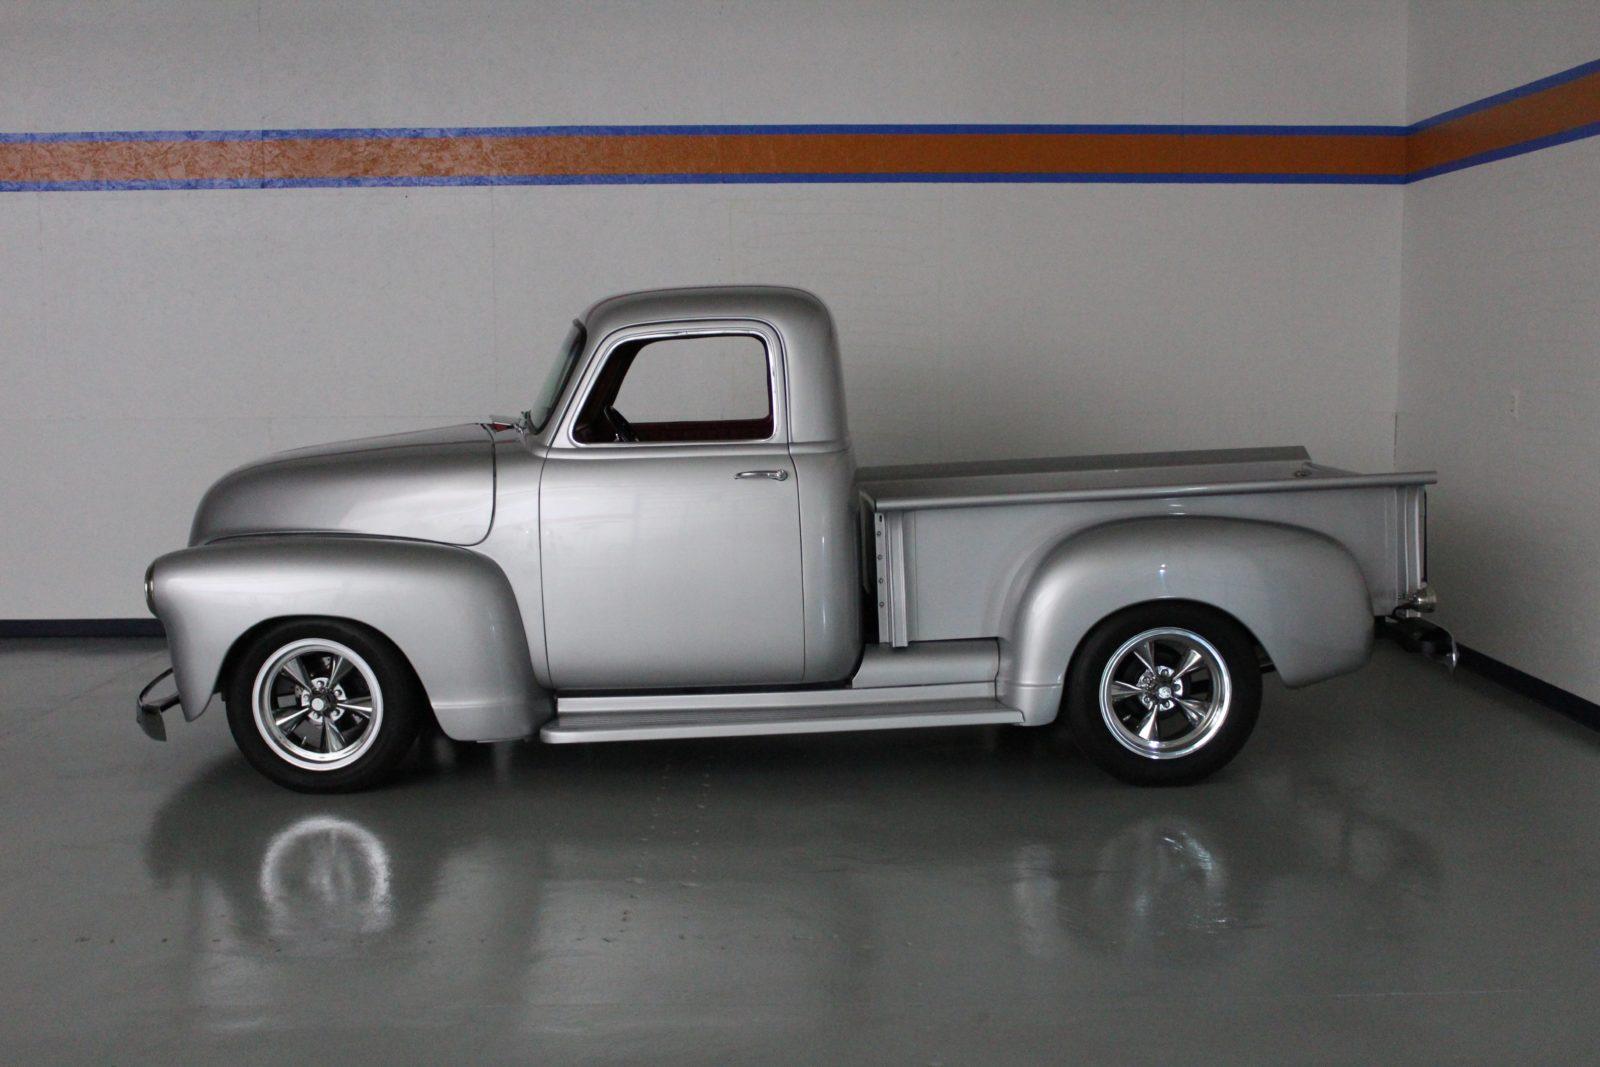 Truck chevy 1955 truck : 1955 Chevy Truck – Mid Atlantic Classic Cars